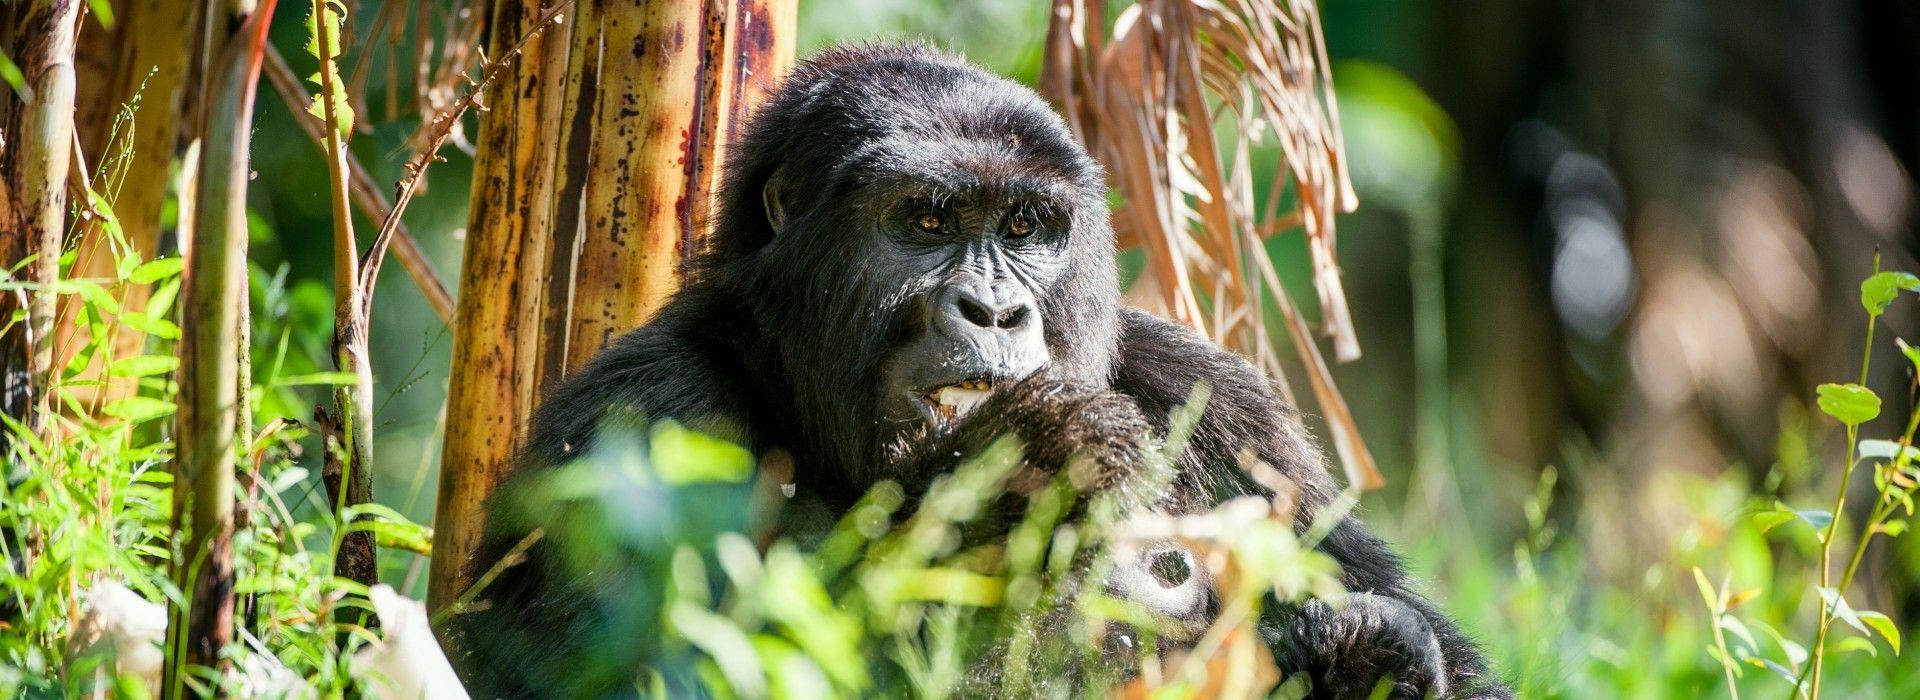 National parks Tours in Uganda